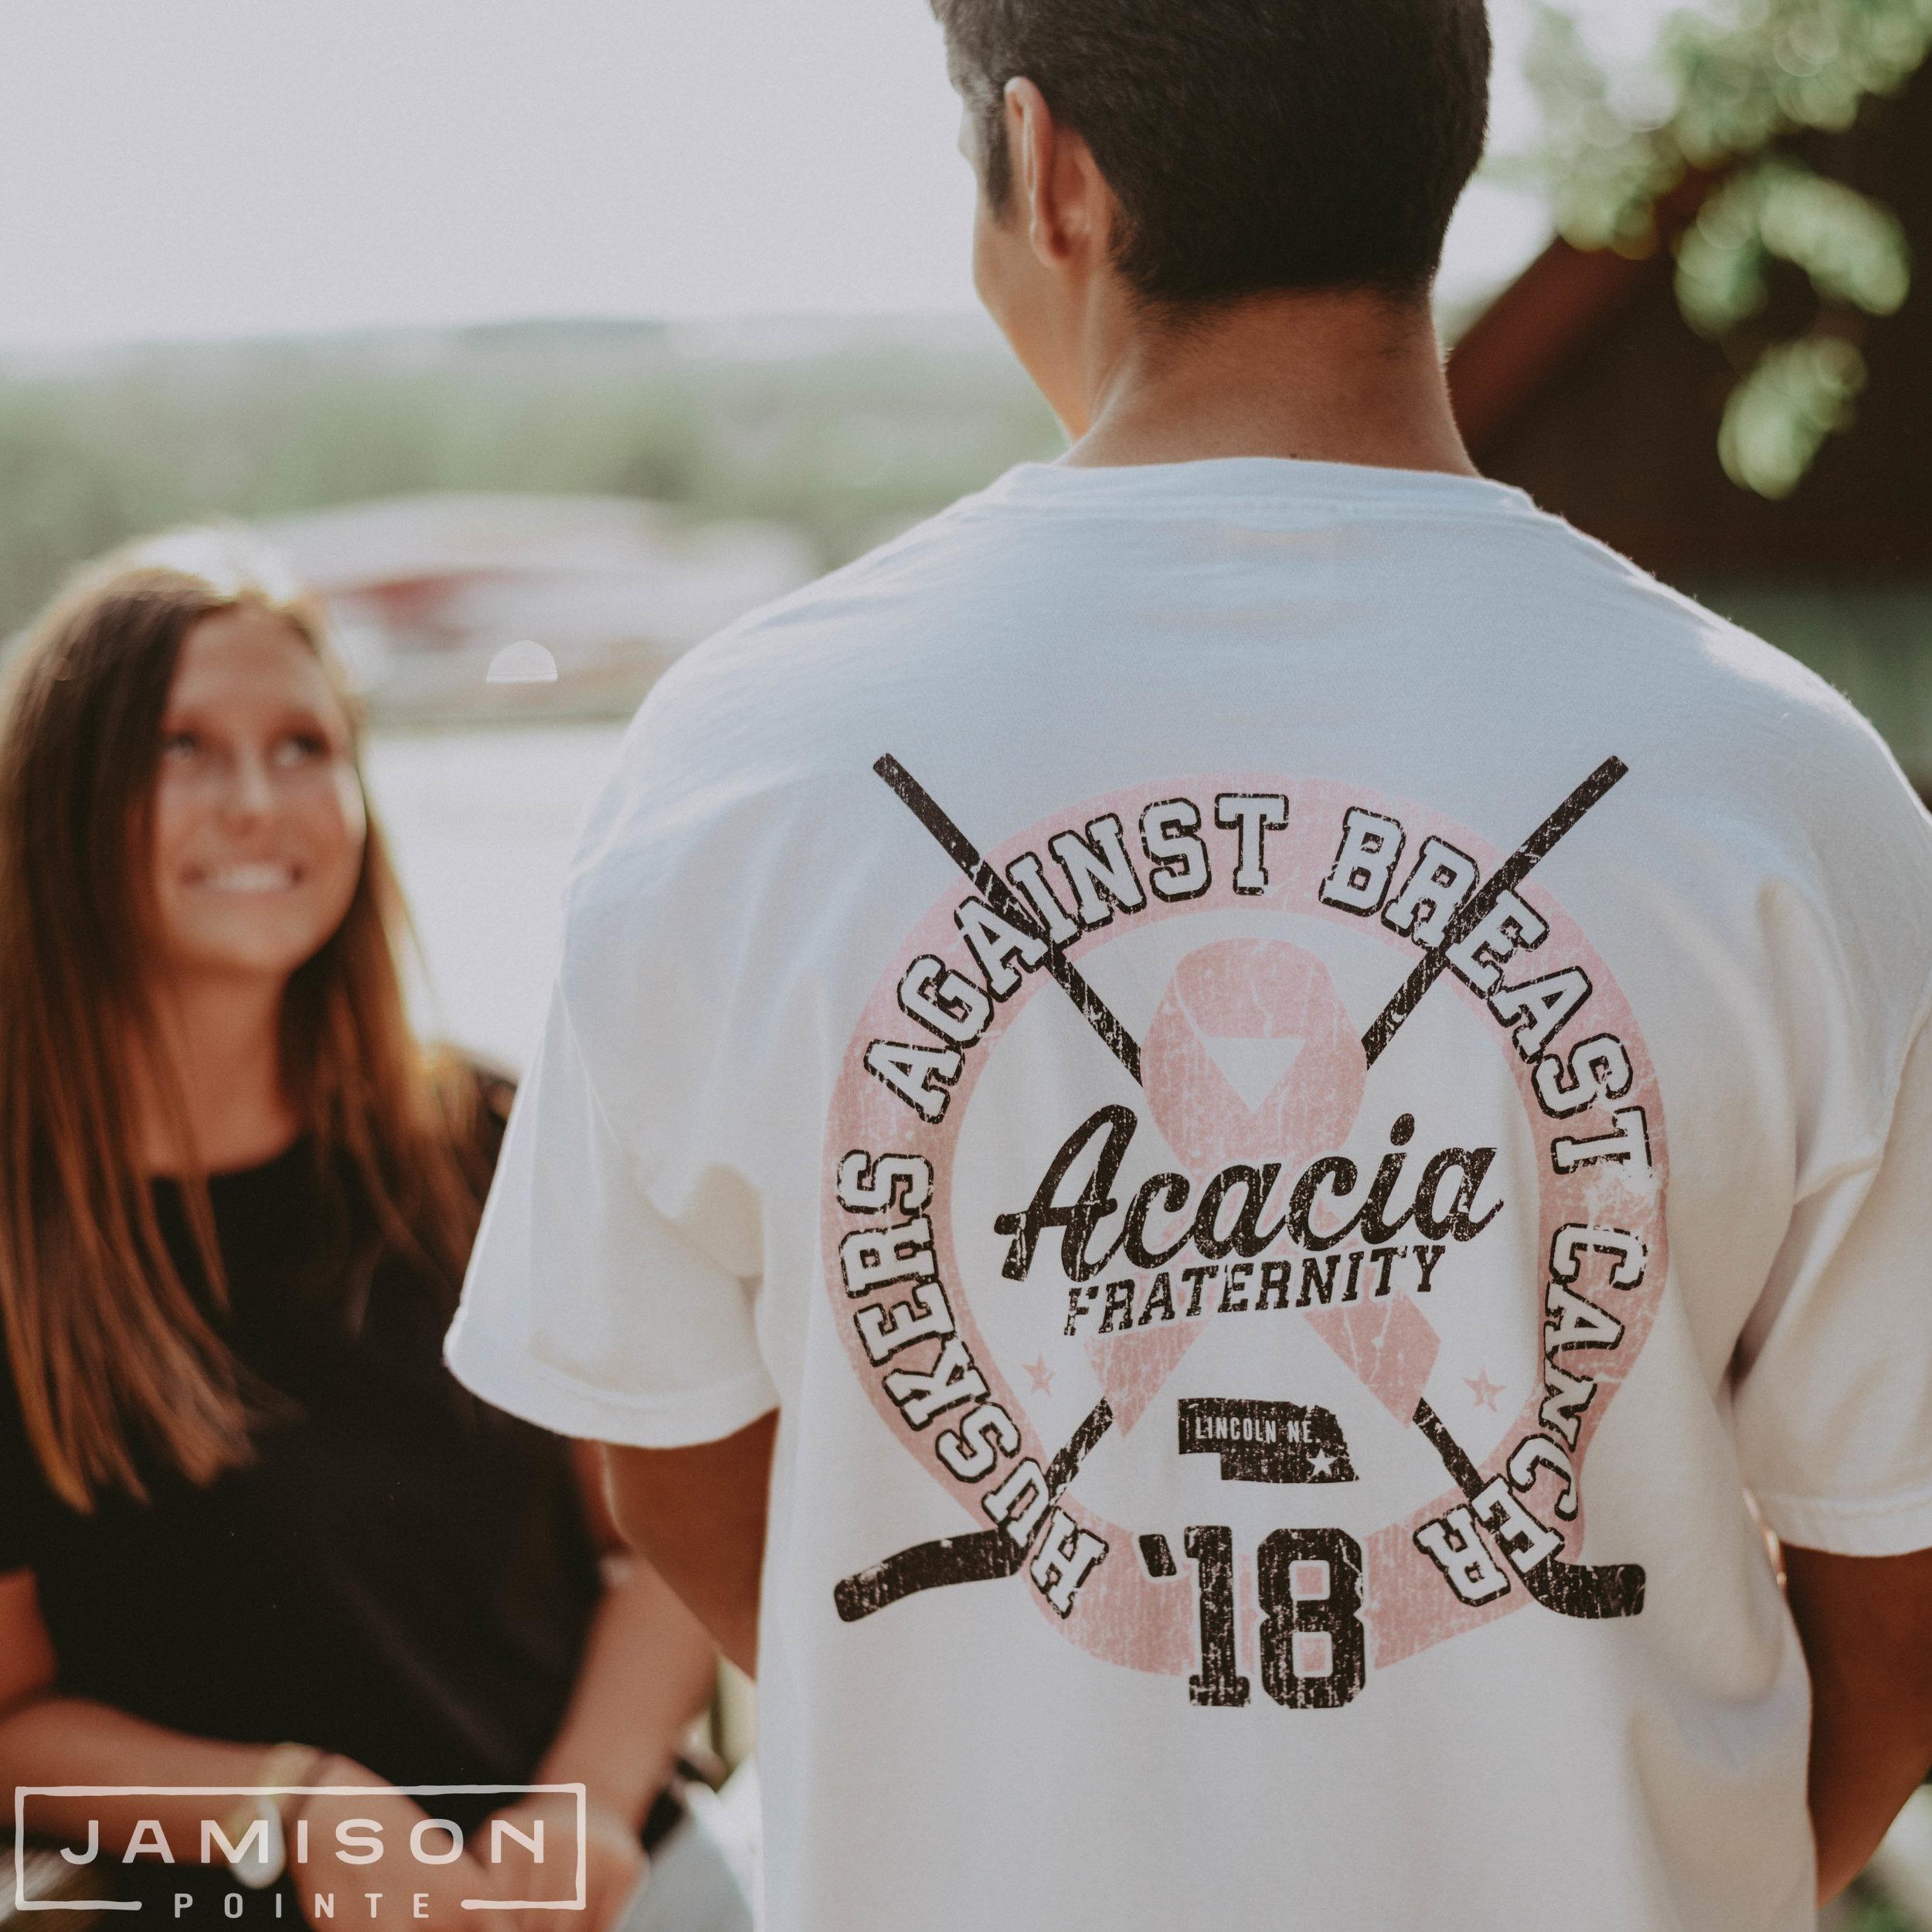 acacia-philanthropy-t-shirt.jpg